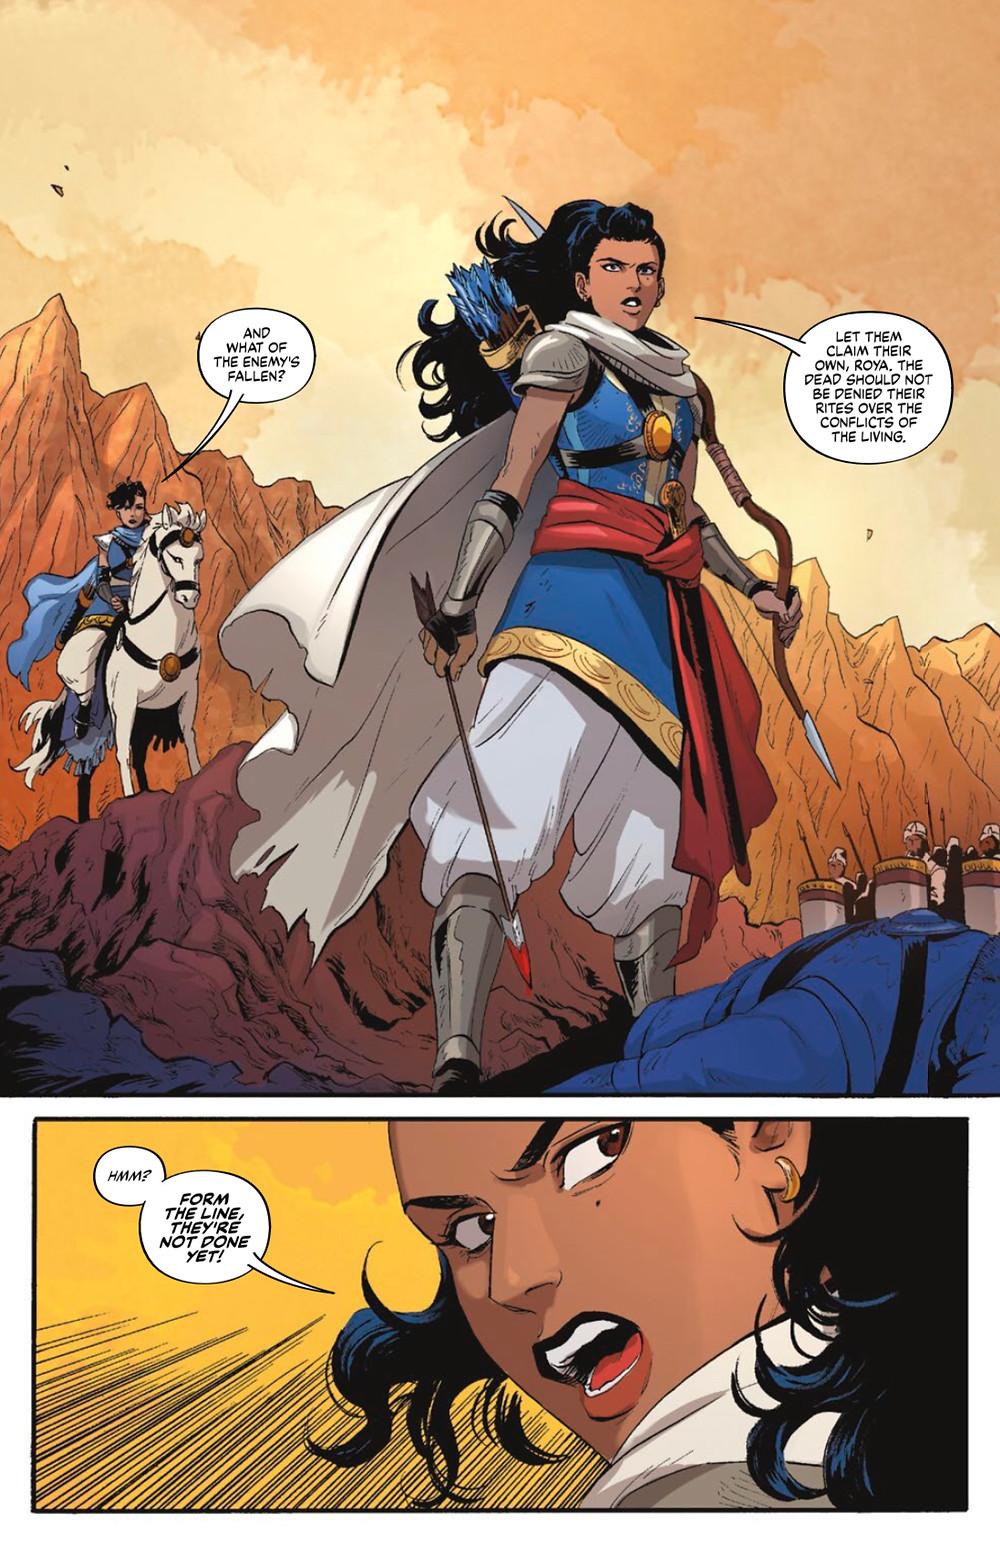 Sera and the Royal Stars, issue #1, Vault Comics, Tsuei/Mok